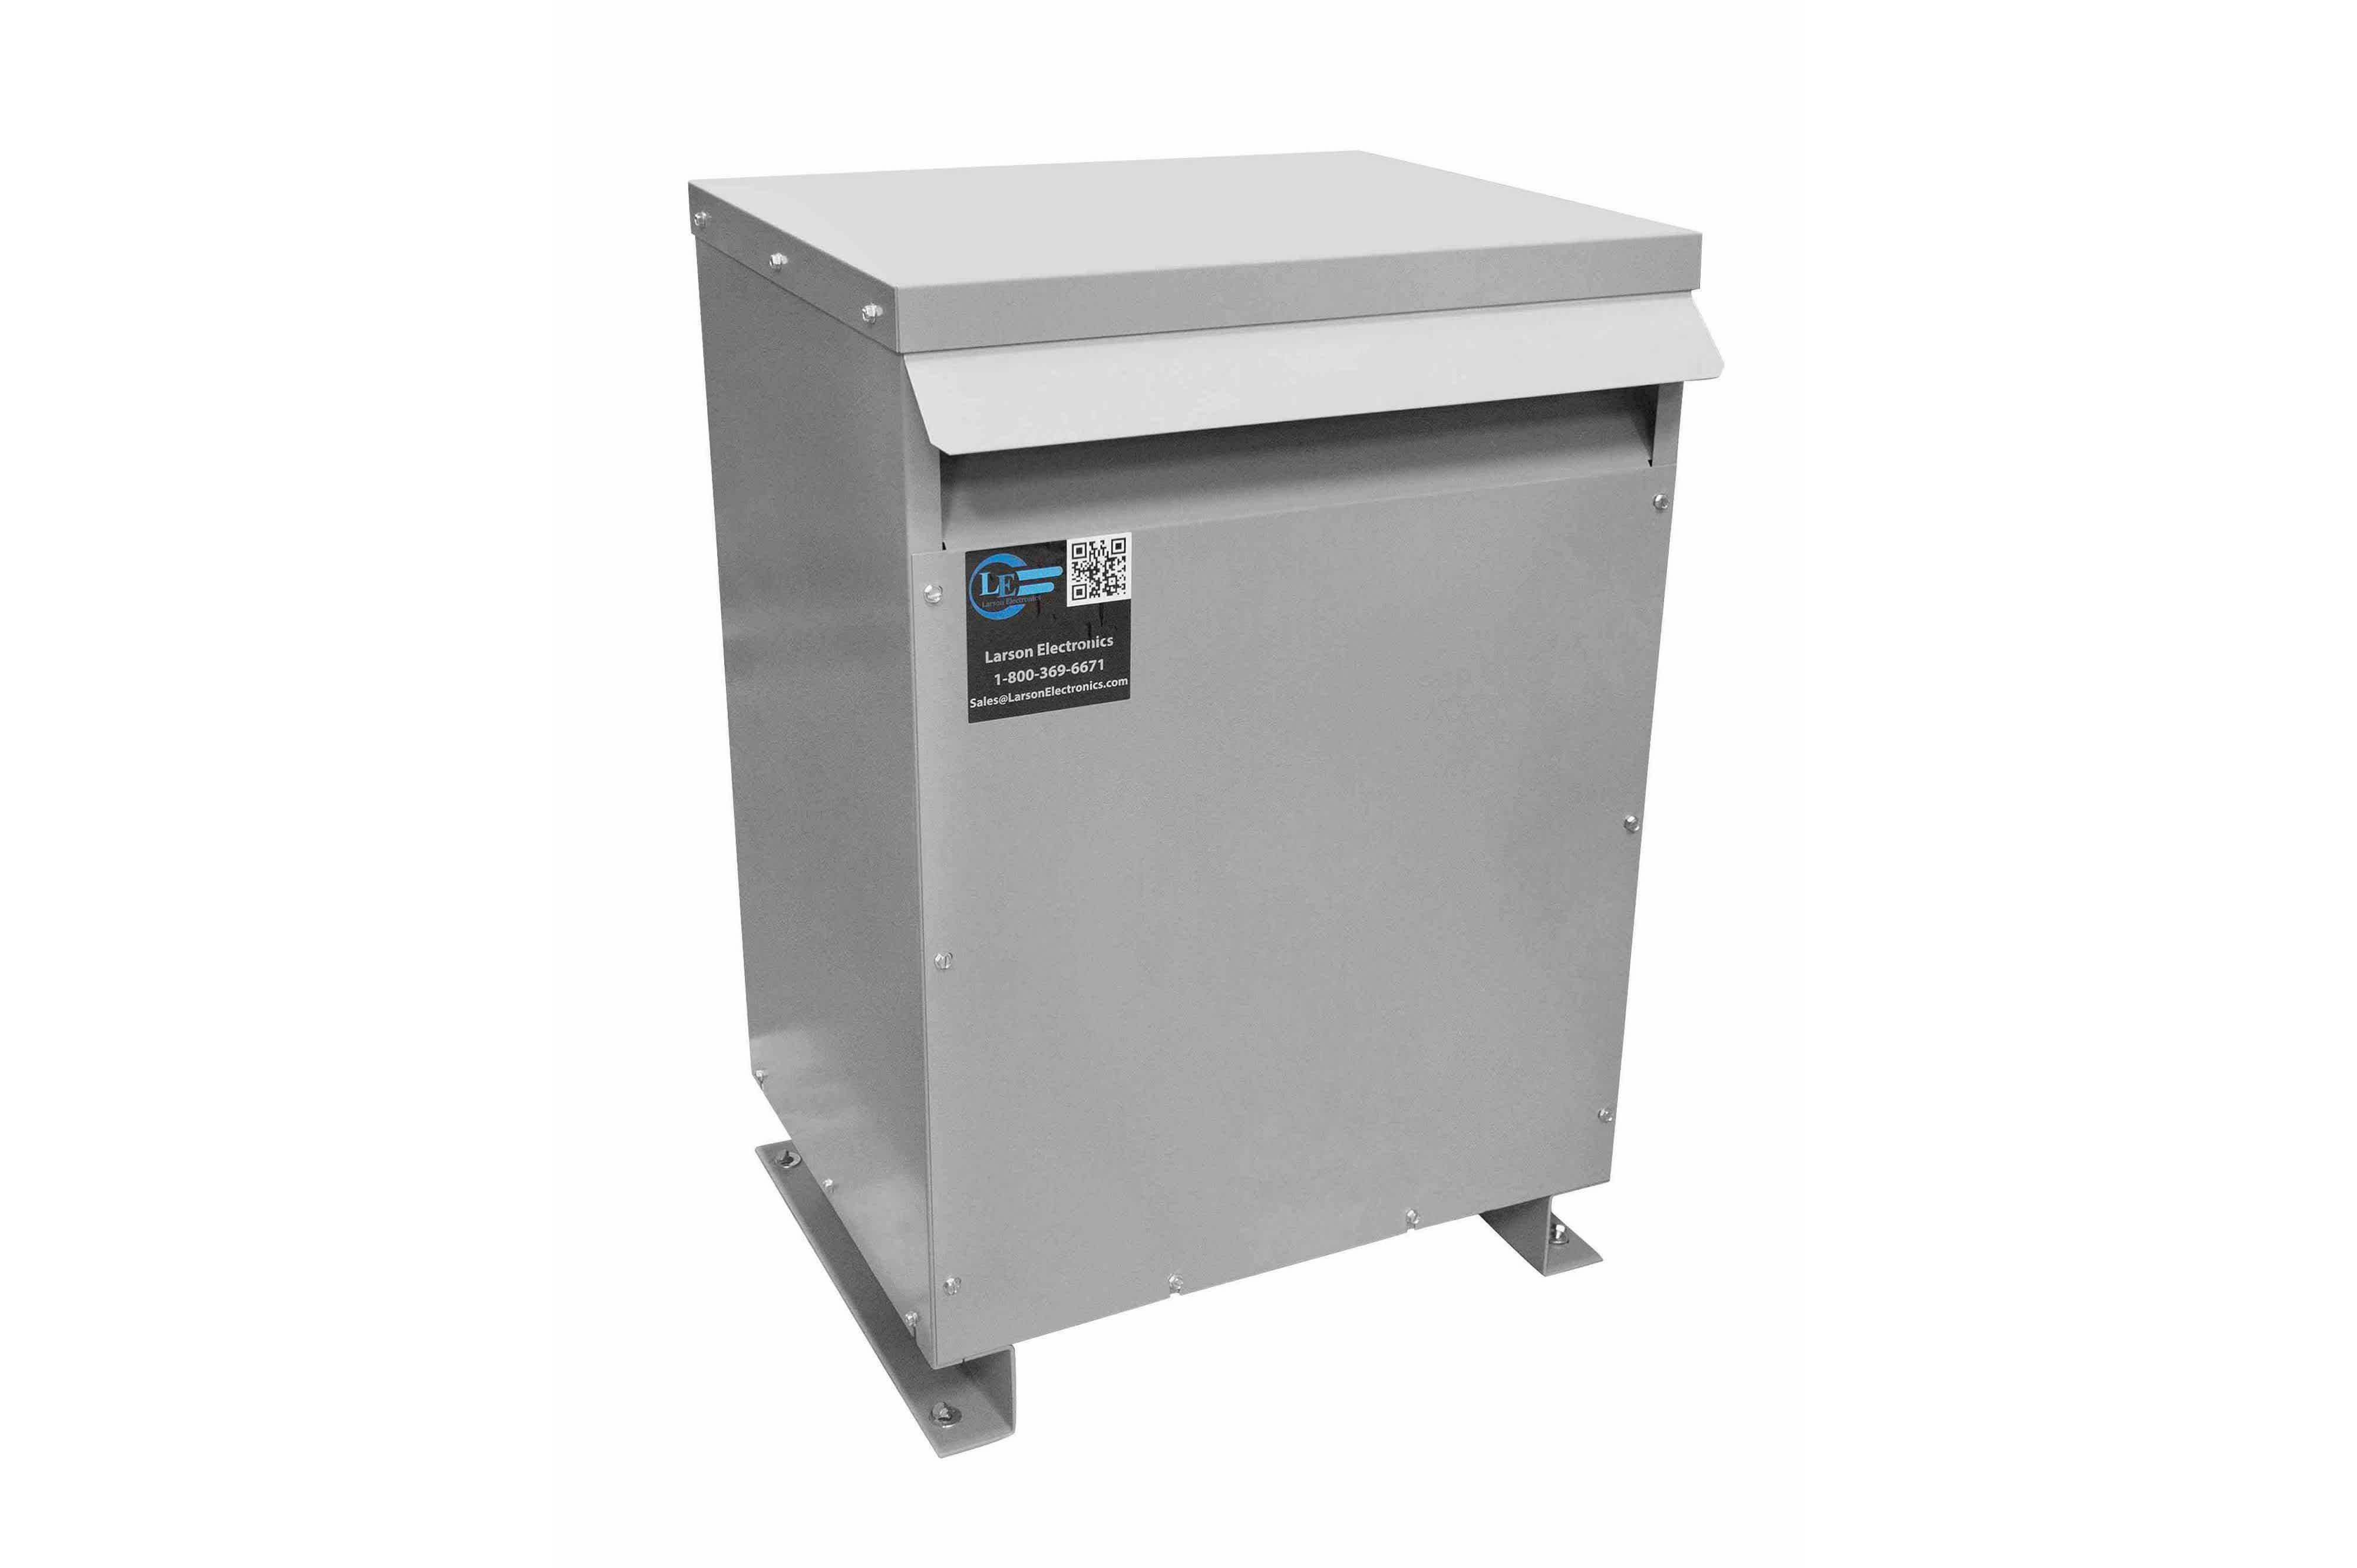 25 kVA 3PH Isolation Transformer, 460V Wye Primary, 240V/120 Delta Secondary, N3R, Ventilated, 60 Hz